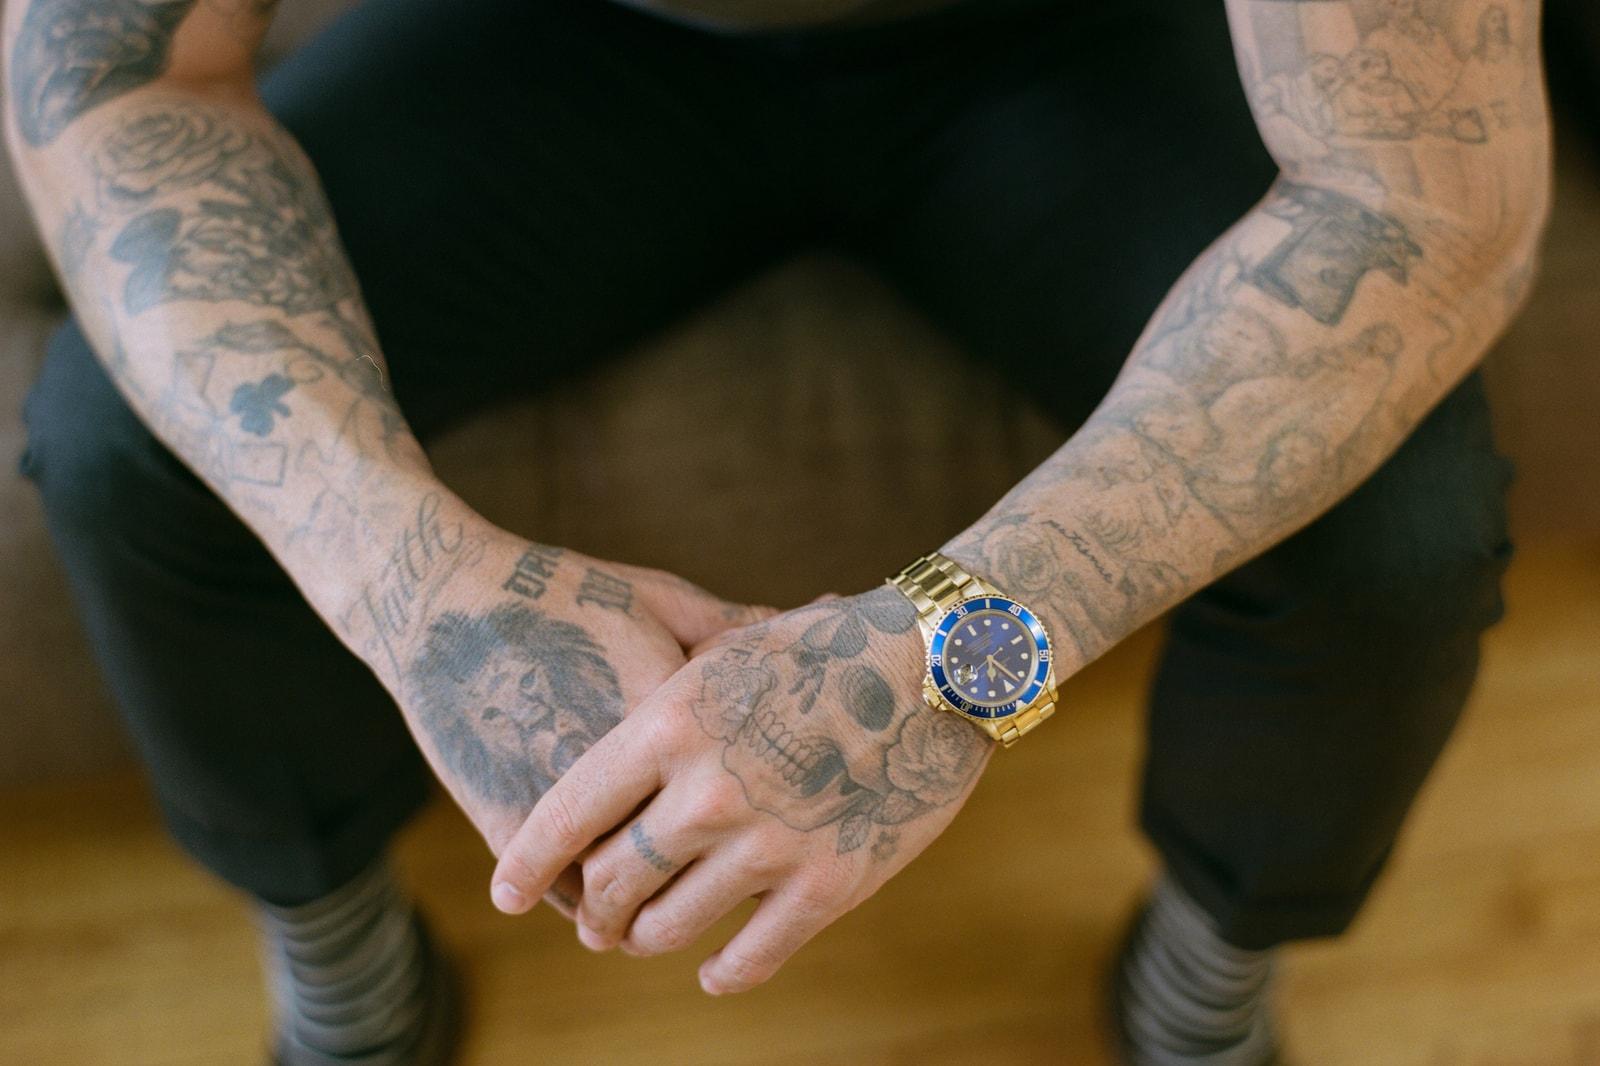 Tattoo Artist Winterstone Interview Tattoos Art Body Art Story Career Lady Gaga La Vie En Rose Work Stories Best Pieces